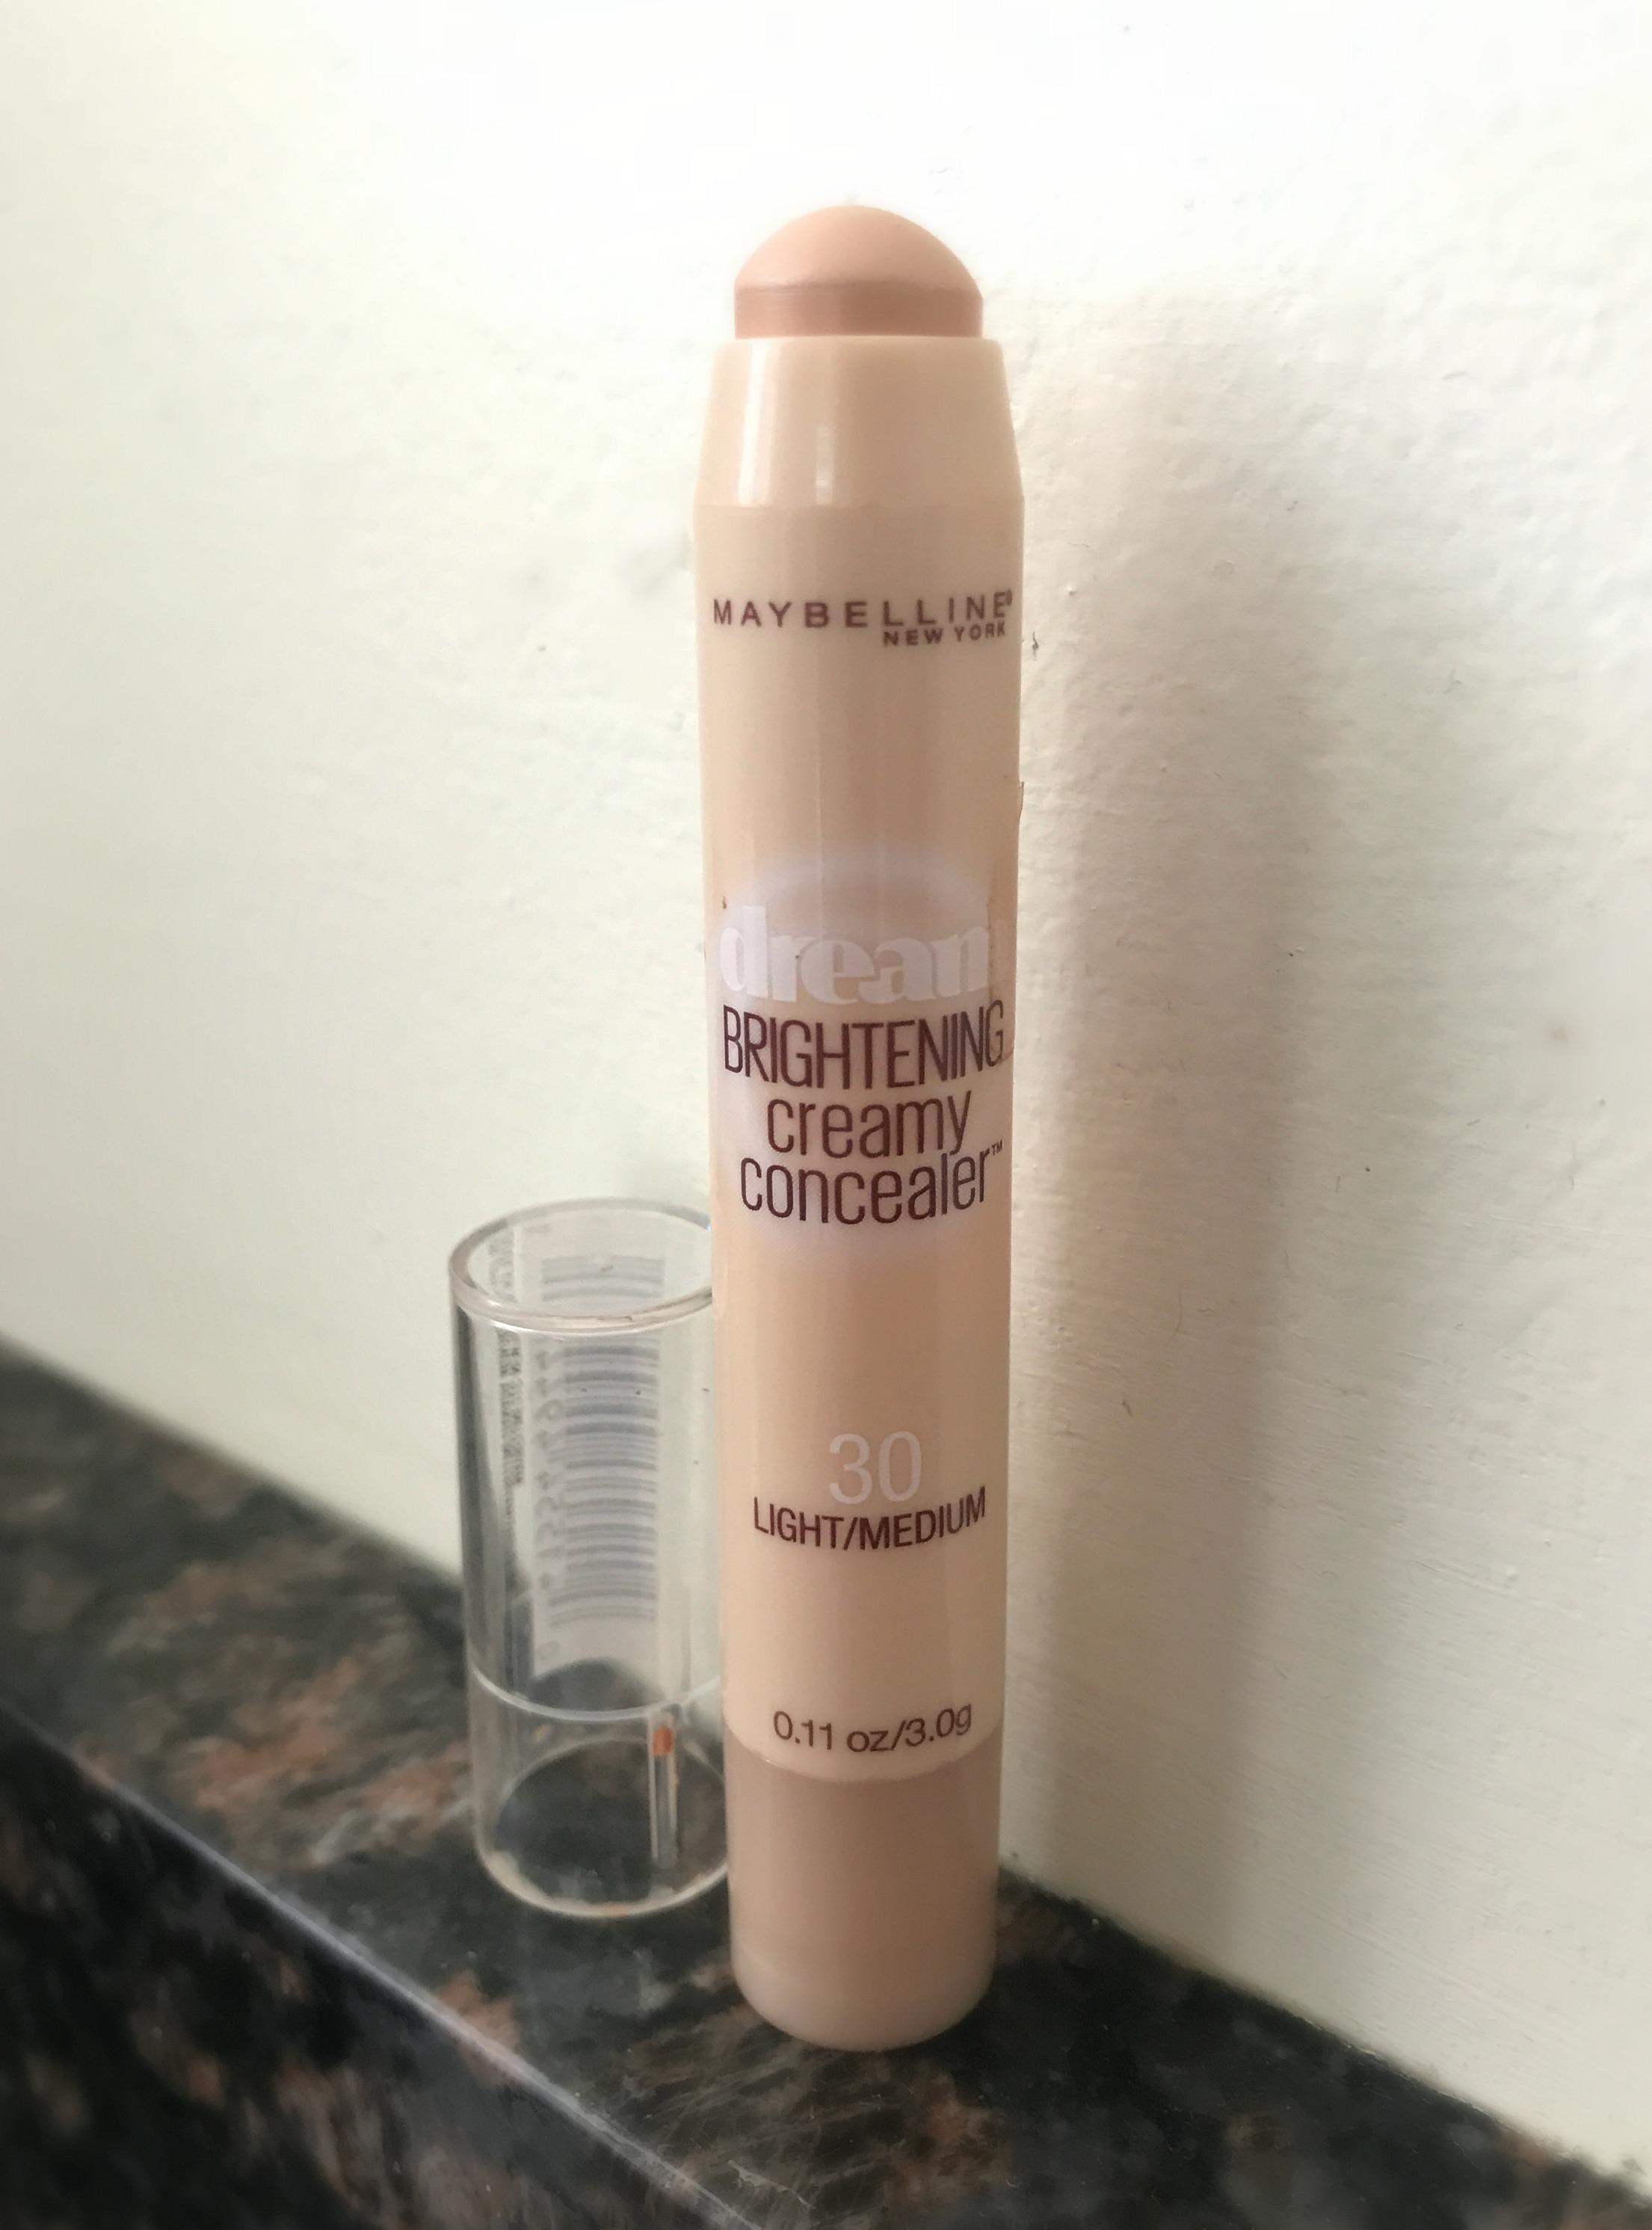 mabelline brightening creamy concealer